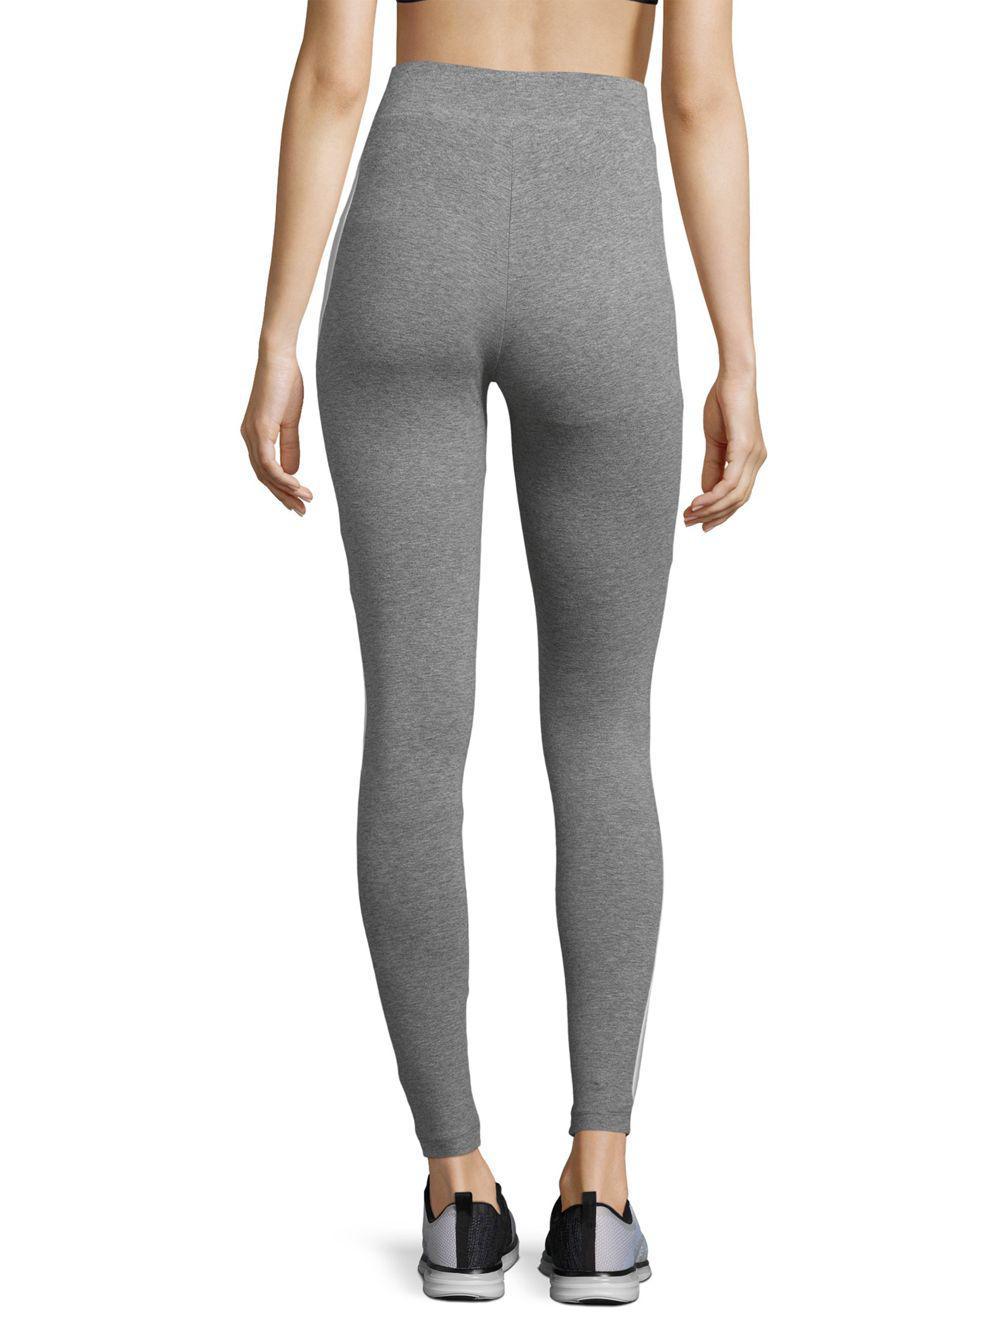 d117fe6d3ac654 PUMA High-waist Leggings in Gray - Lyst